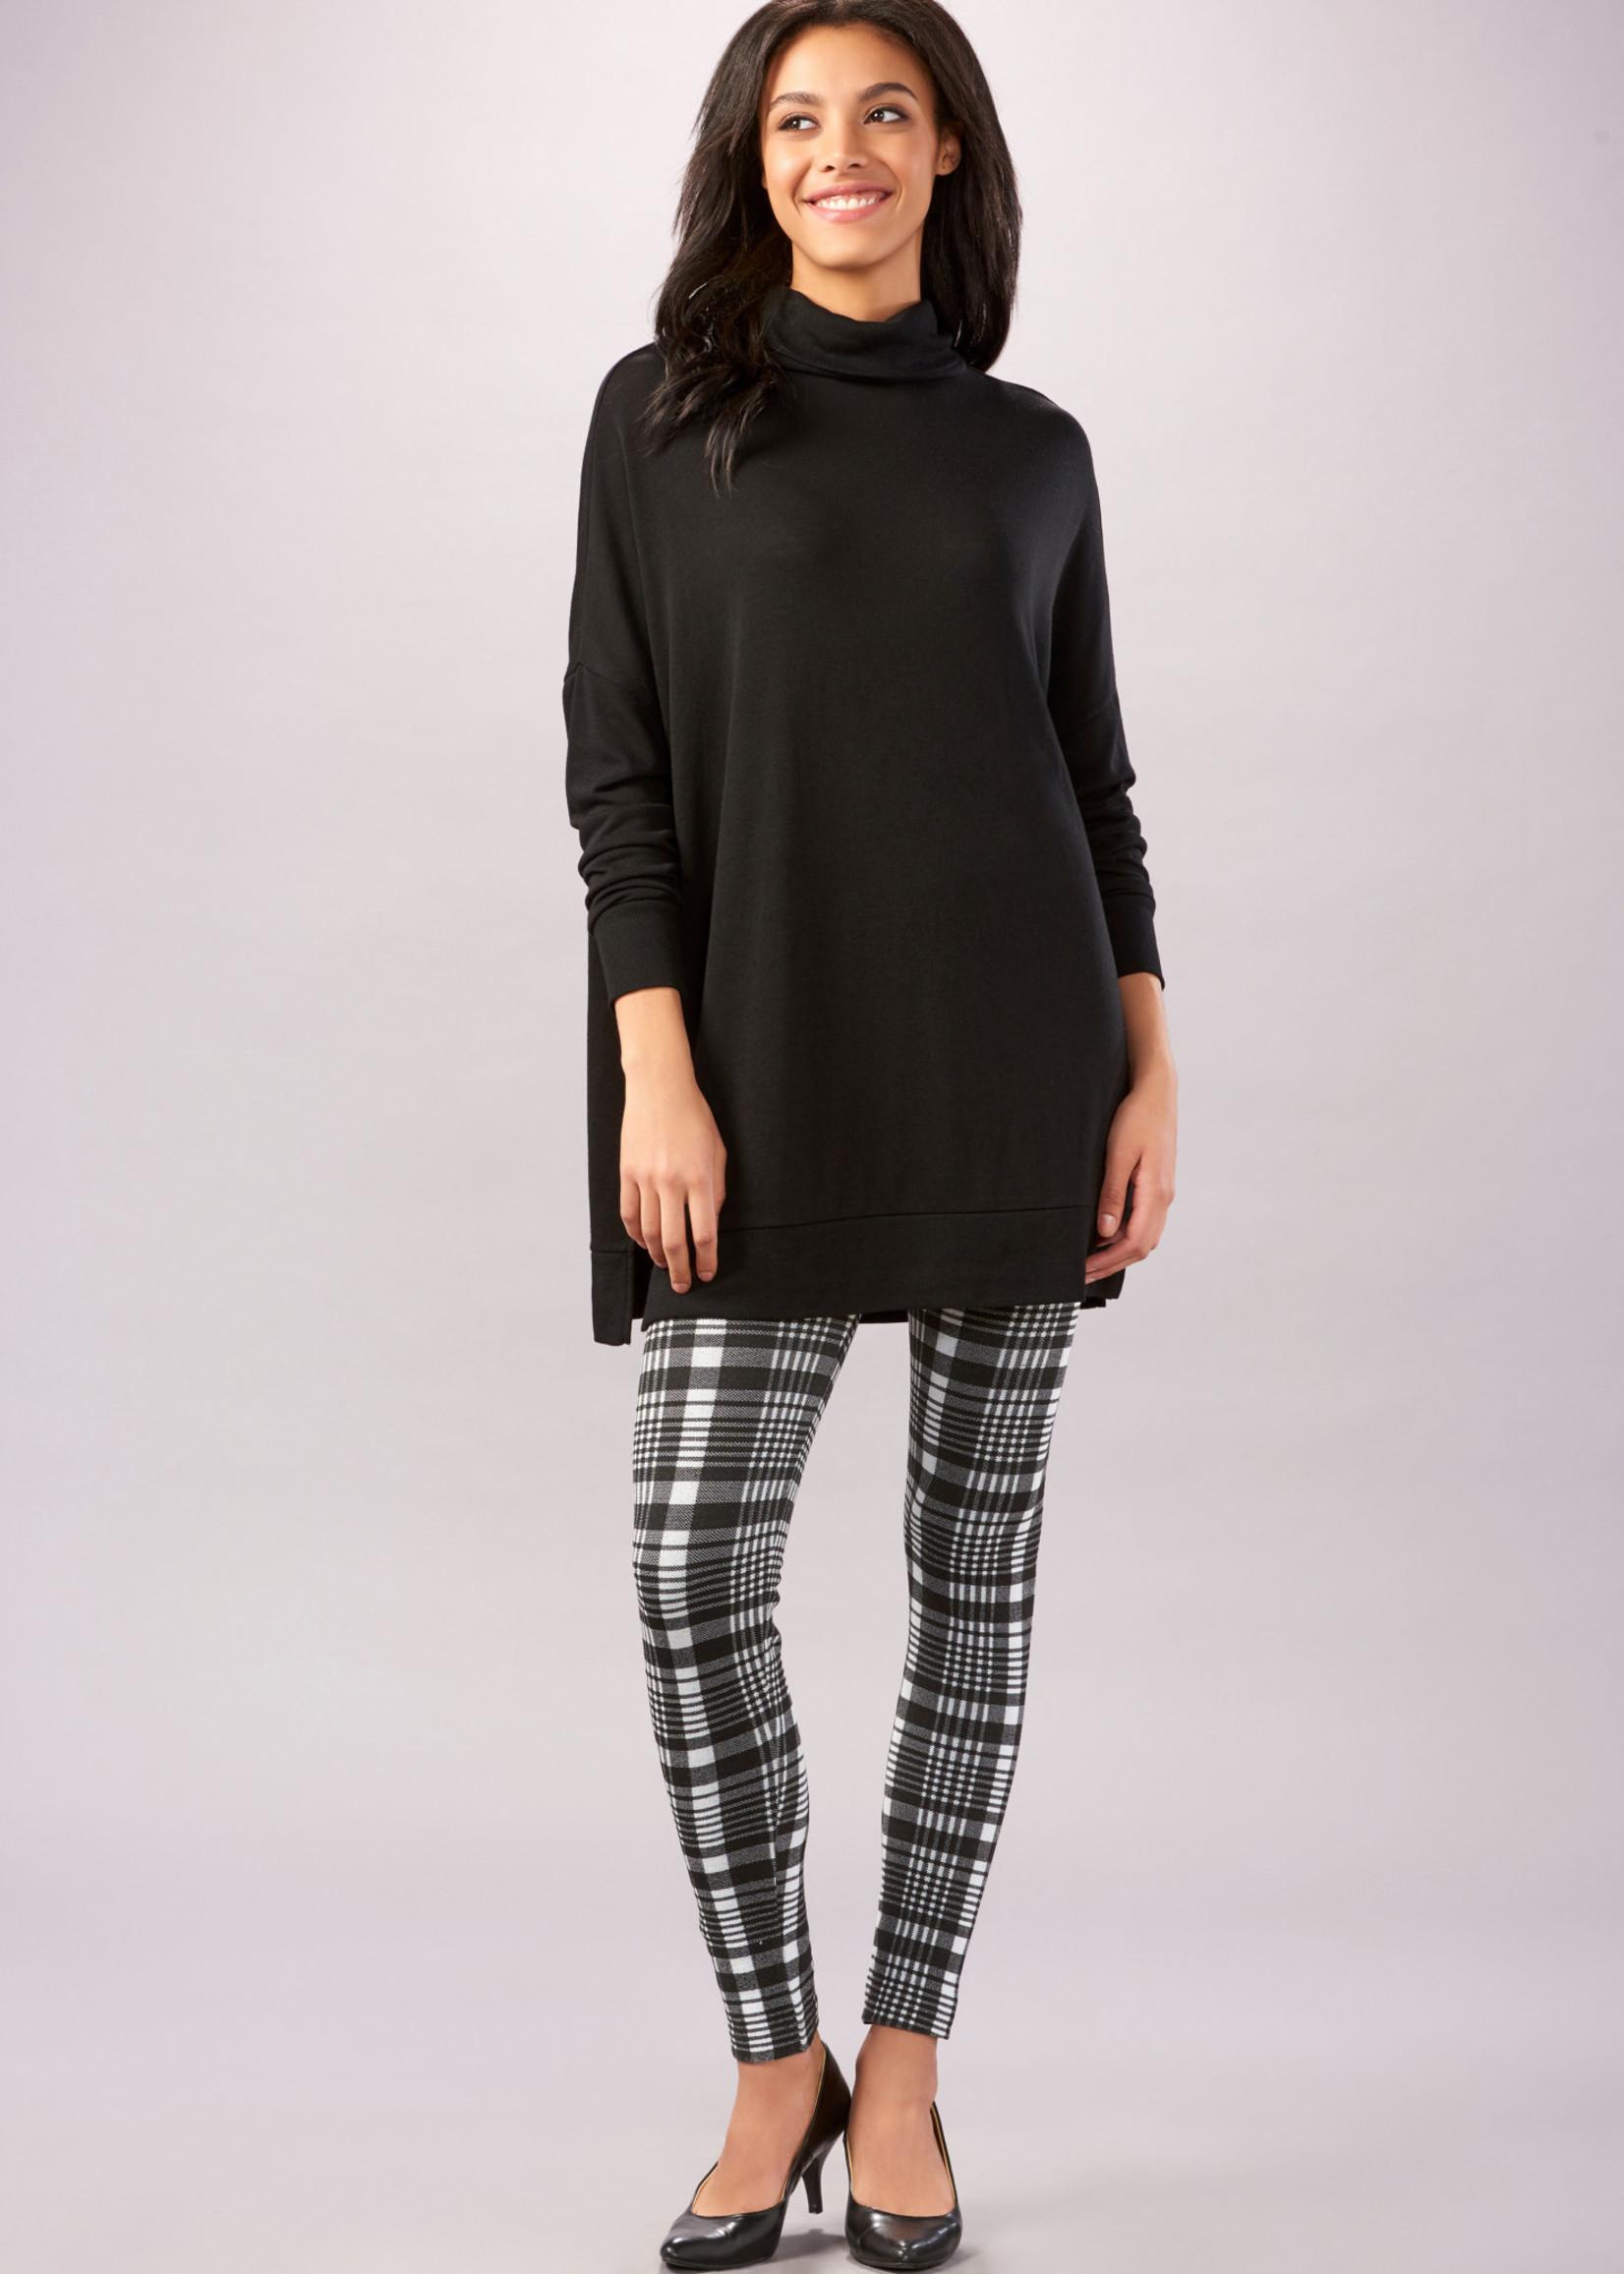 Charlie Page S/M Black & Grey Plaid Fleece Lined Leggings